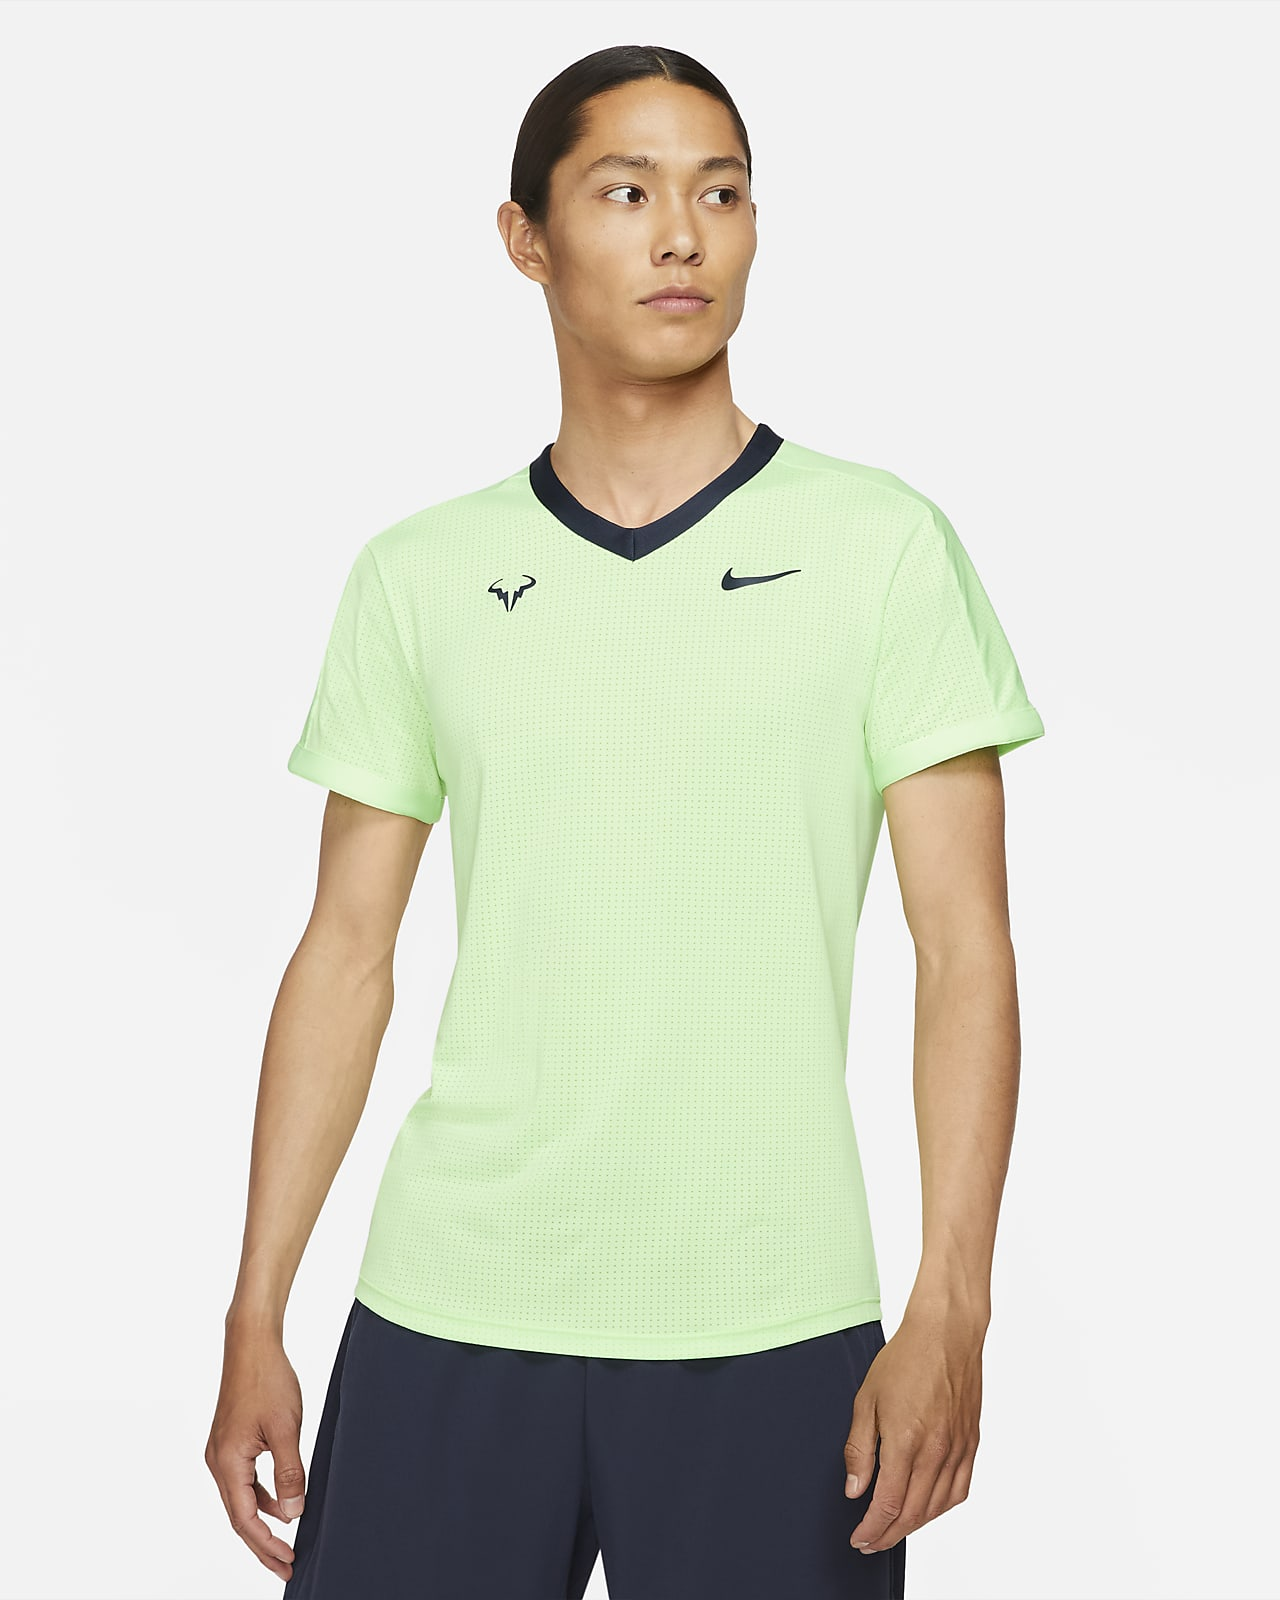 Camisola de ténis de manga curta NikeCourt Dri-FIT ADV Rafa para homem